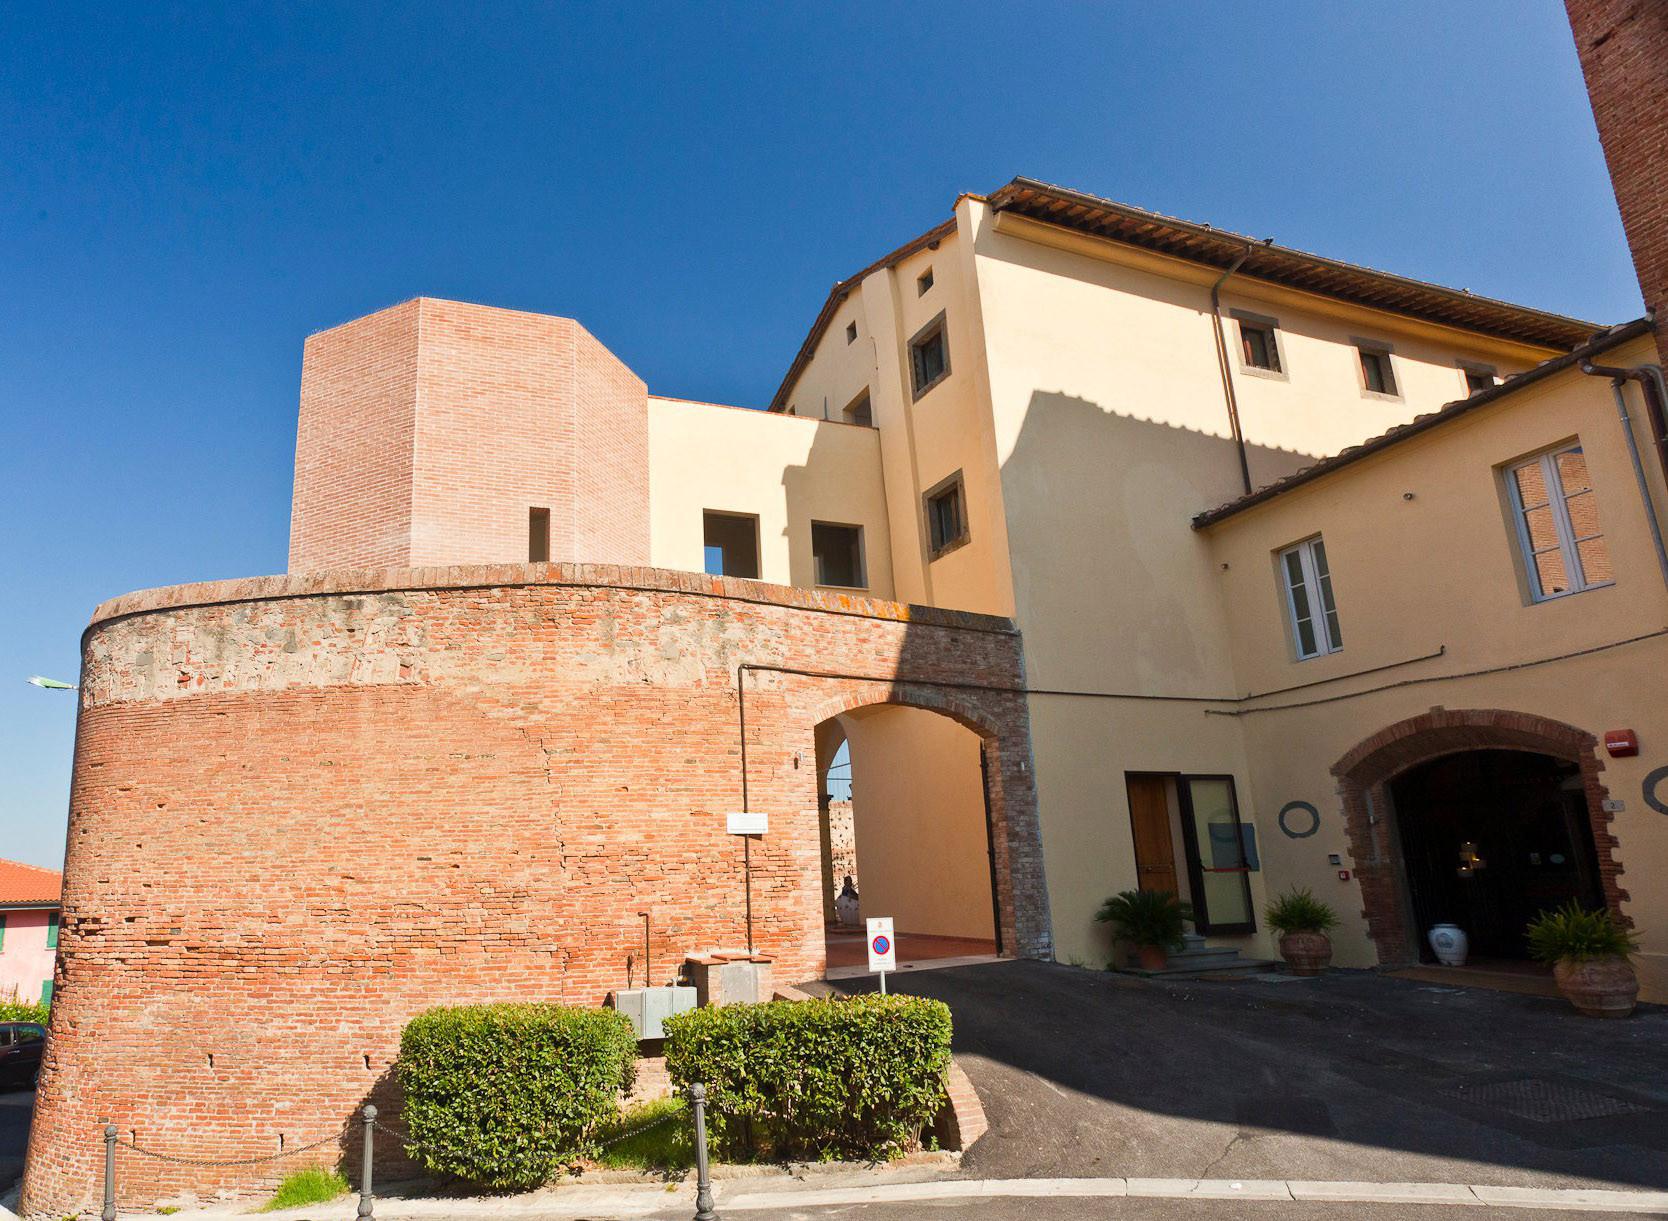 Designhotel san miniato italia golf tours for Designhotel toskana